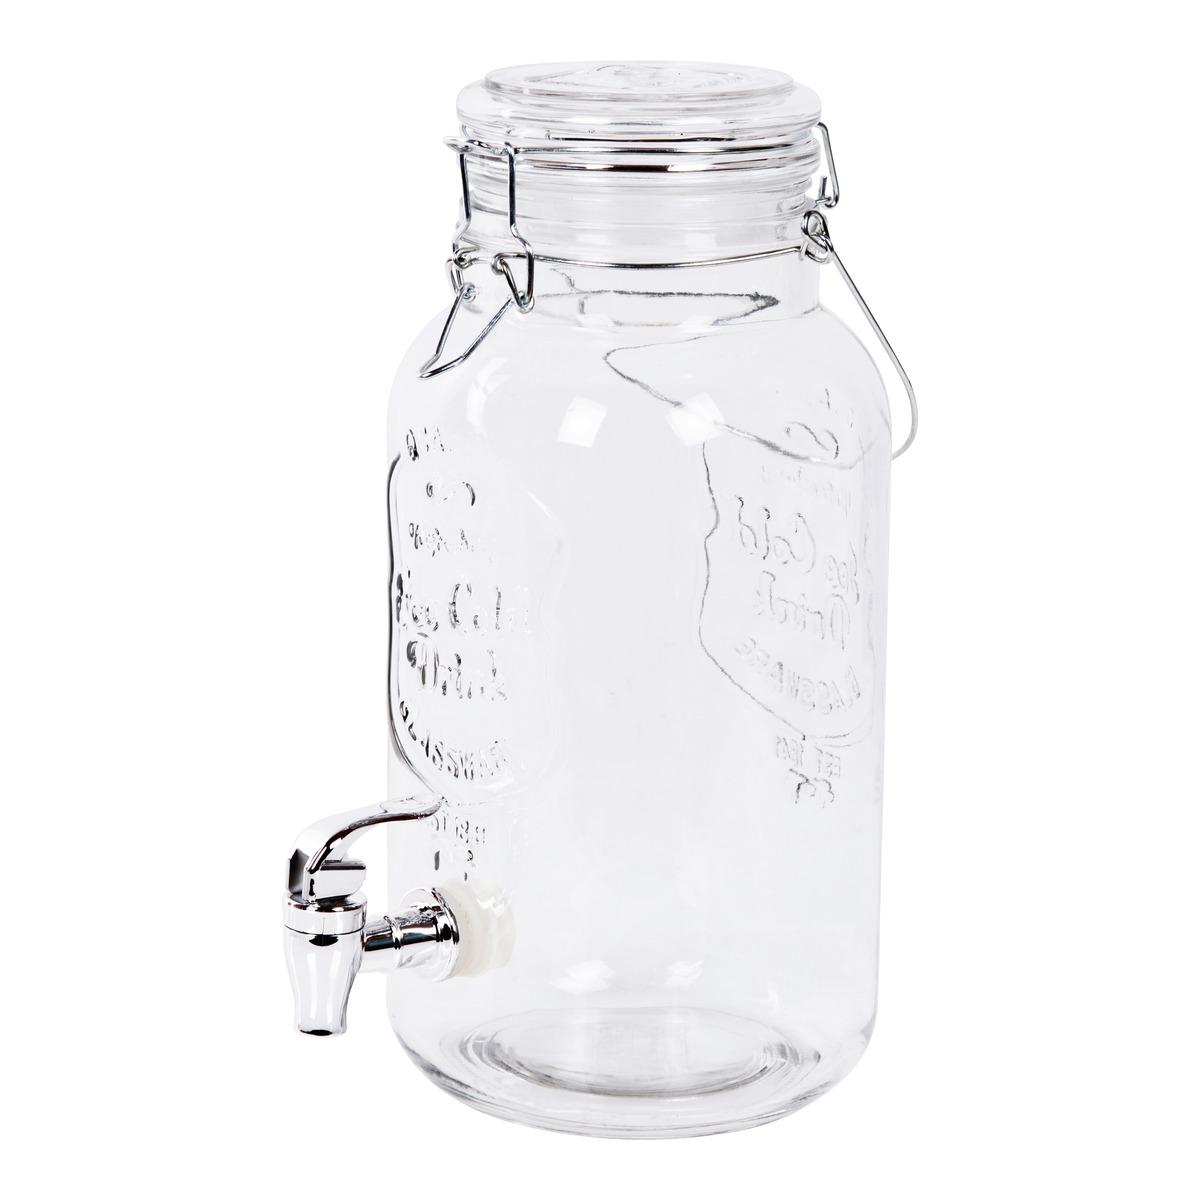 vannbeholder med tappekran